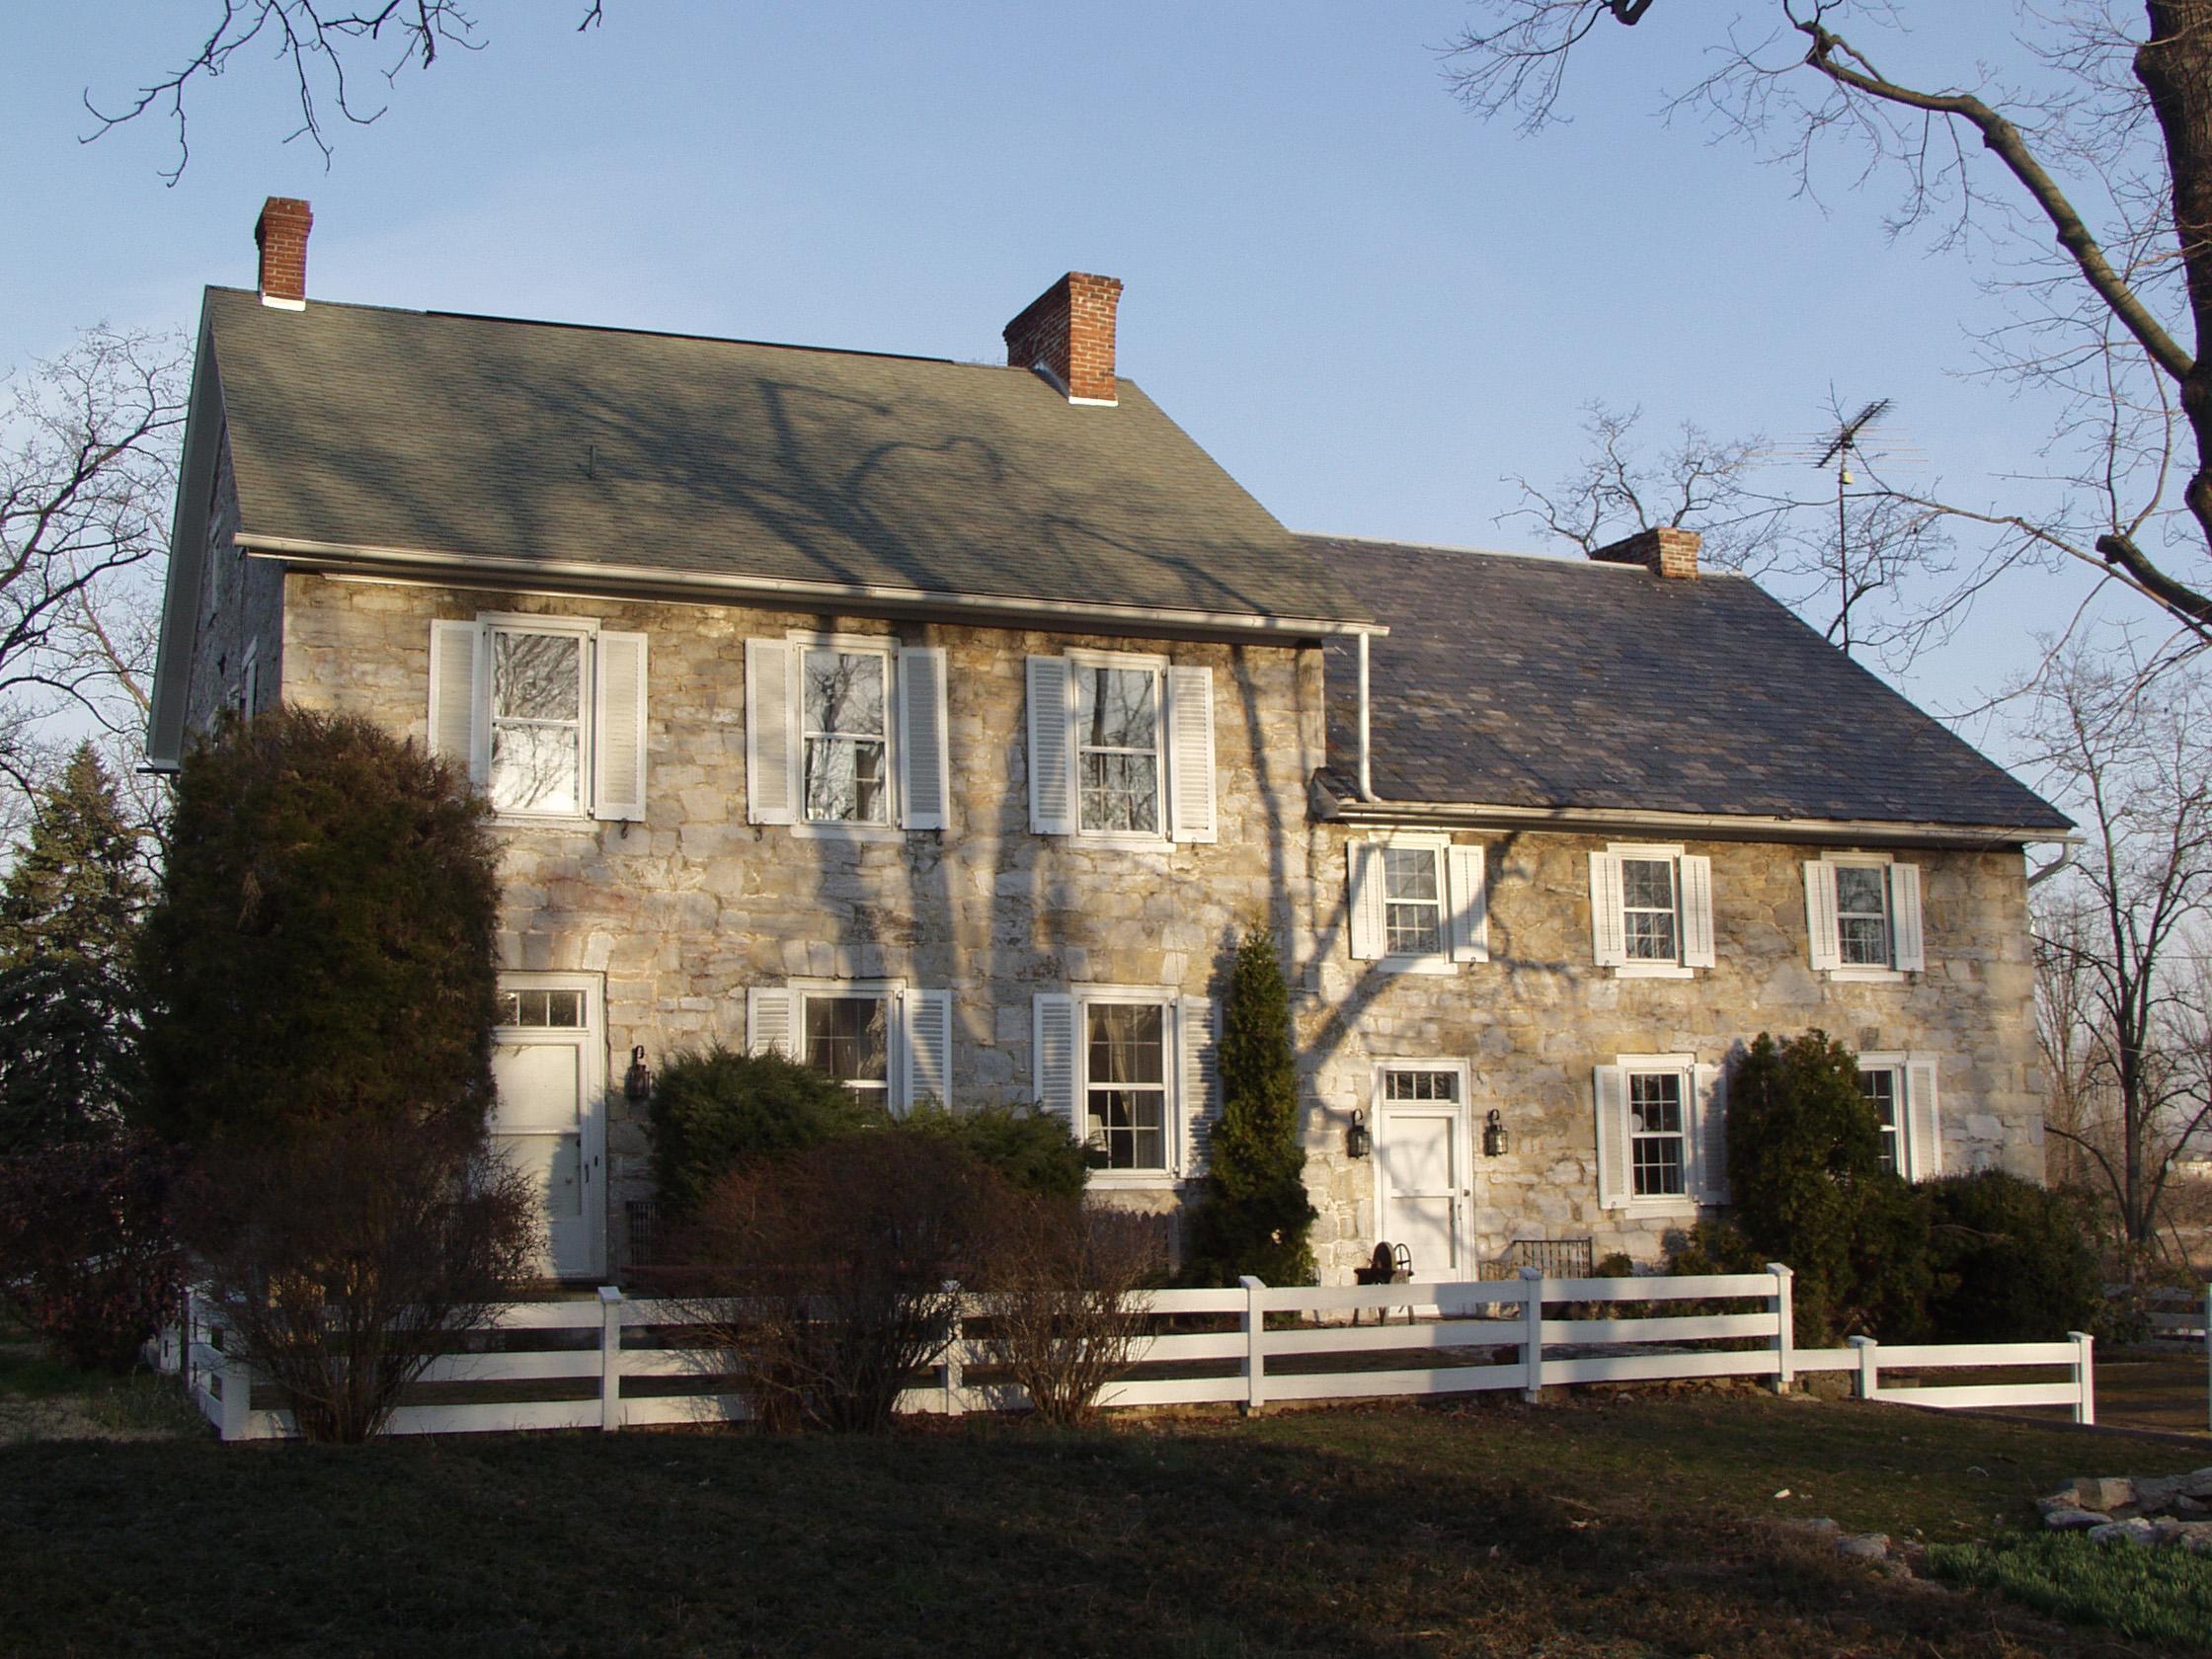 Allison-Ebbert House